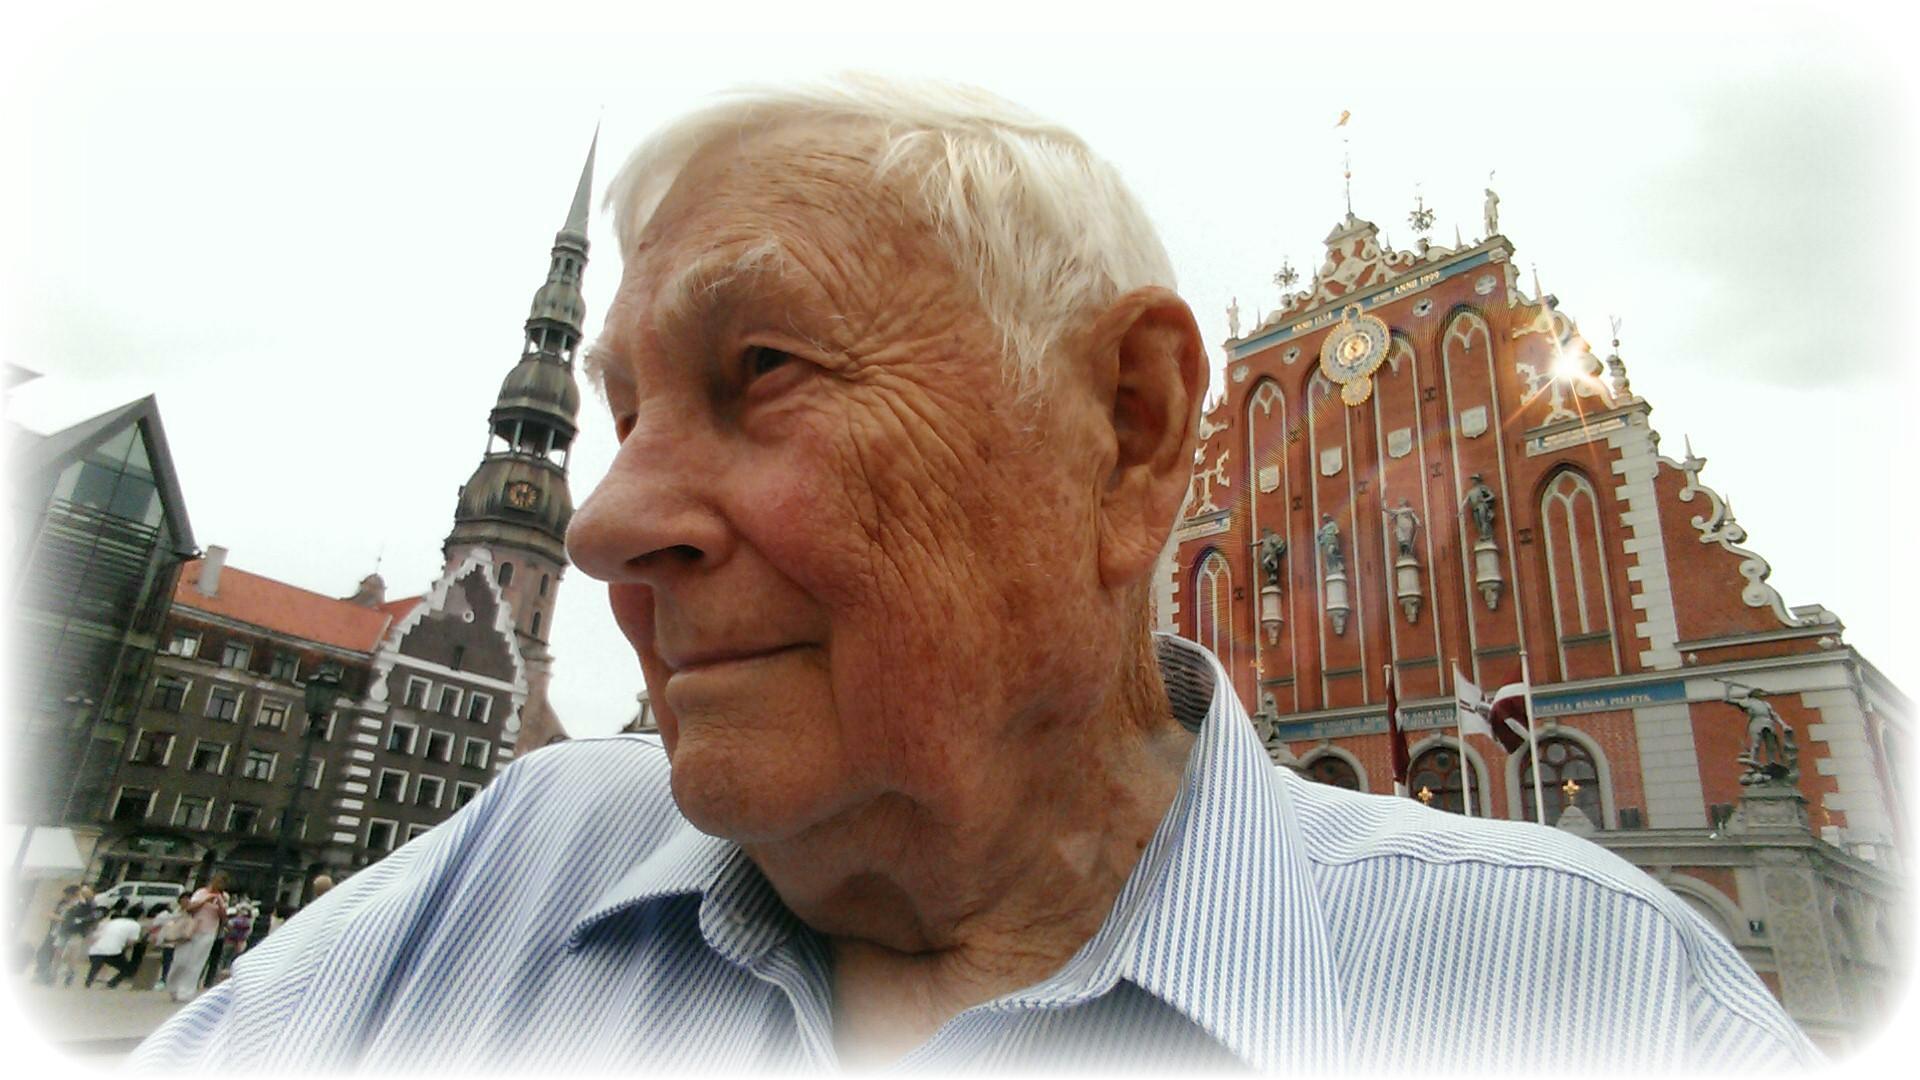 dad in Riga. Vignette w Sun.jpg